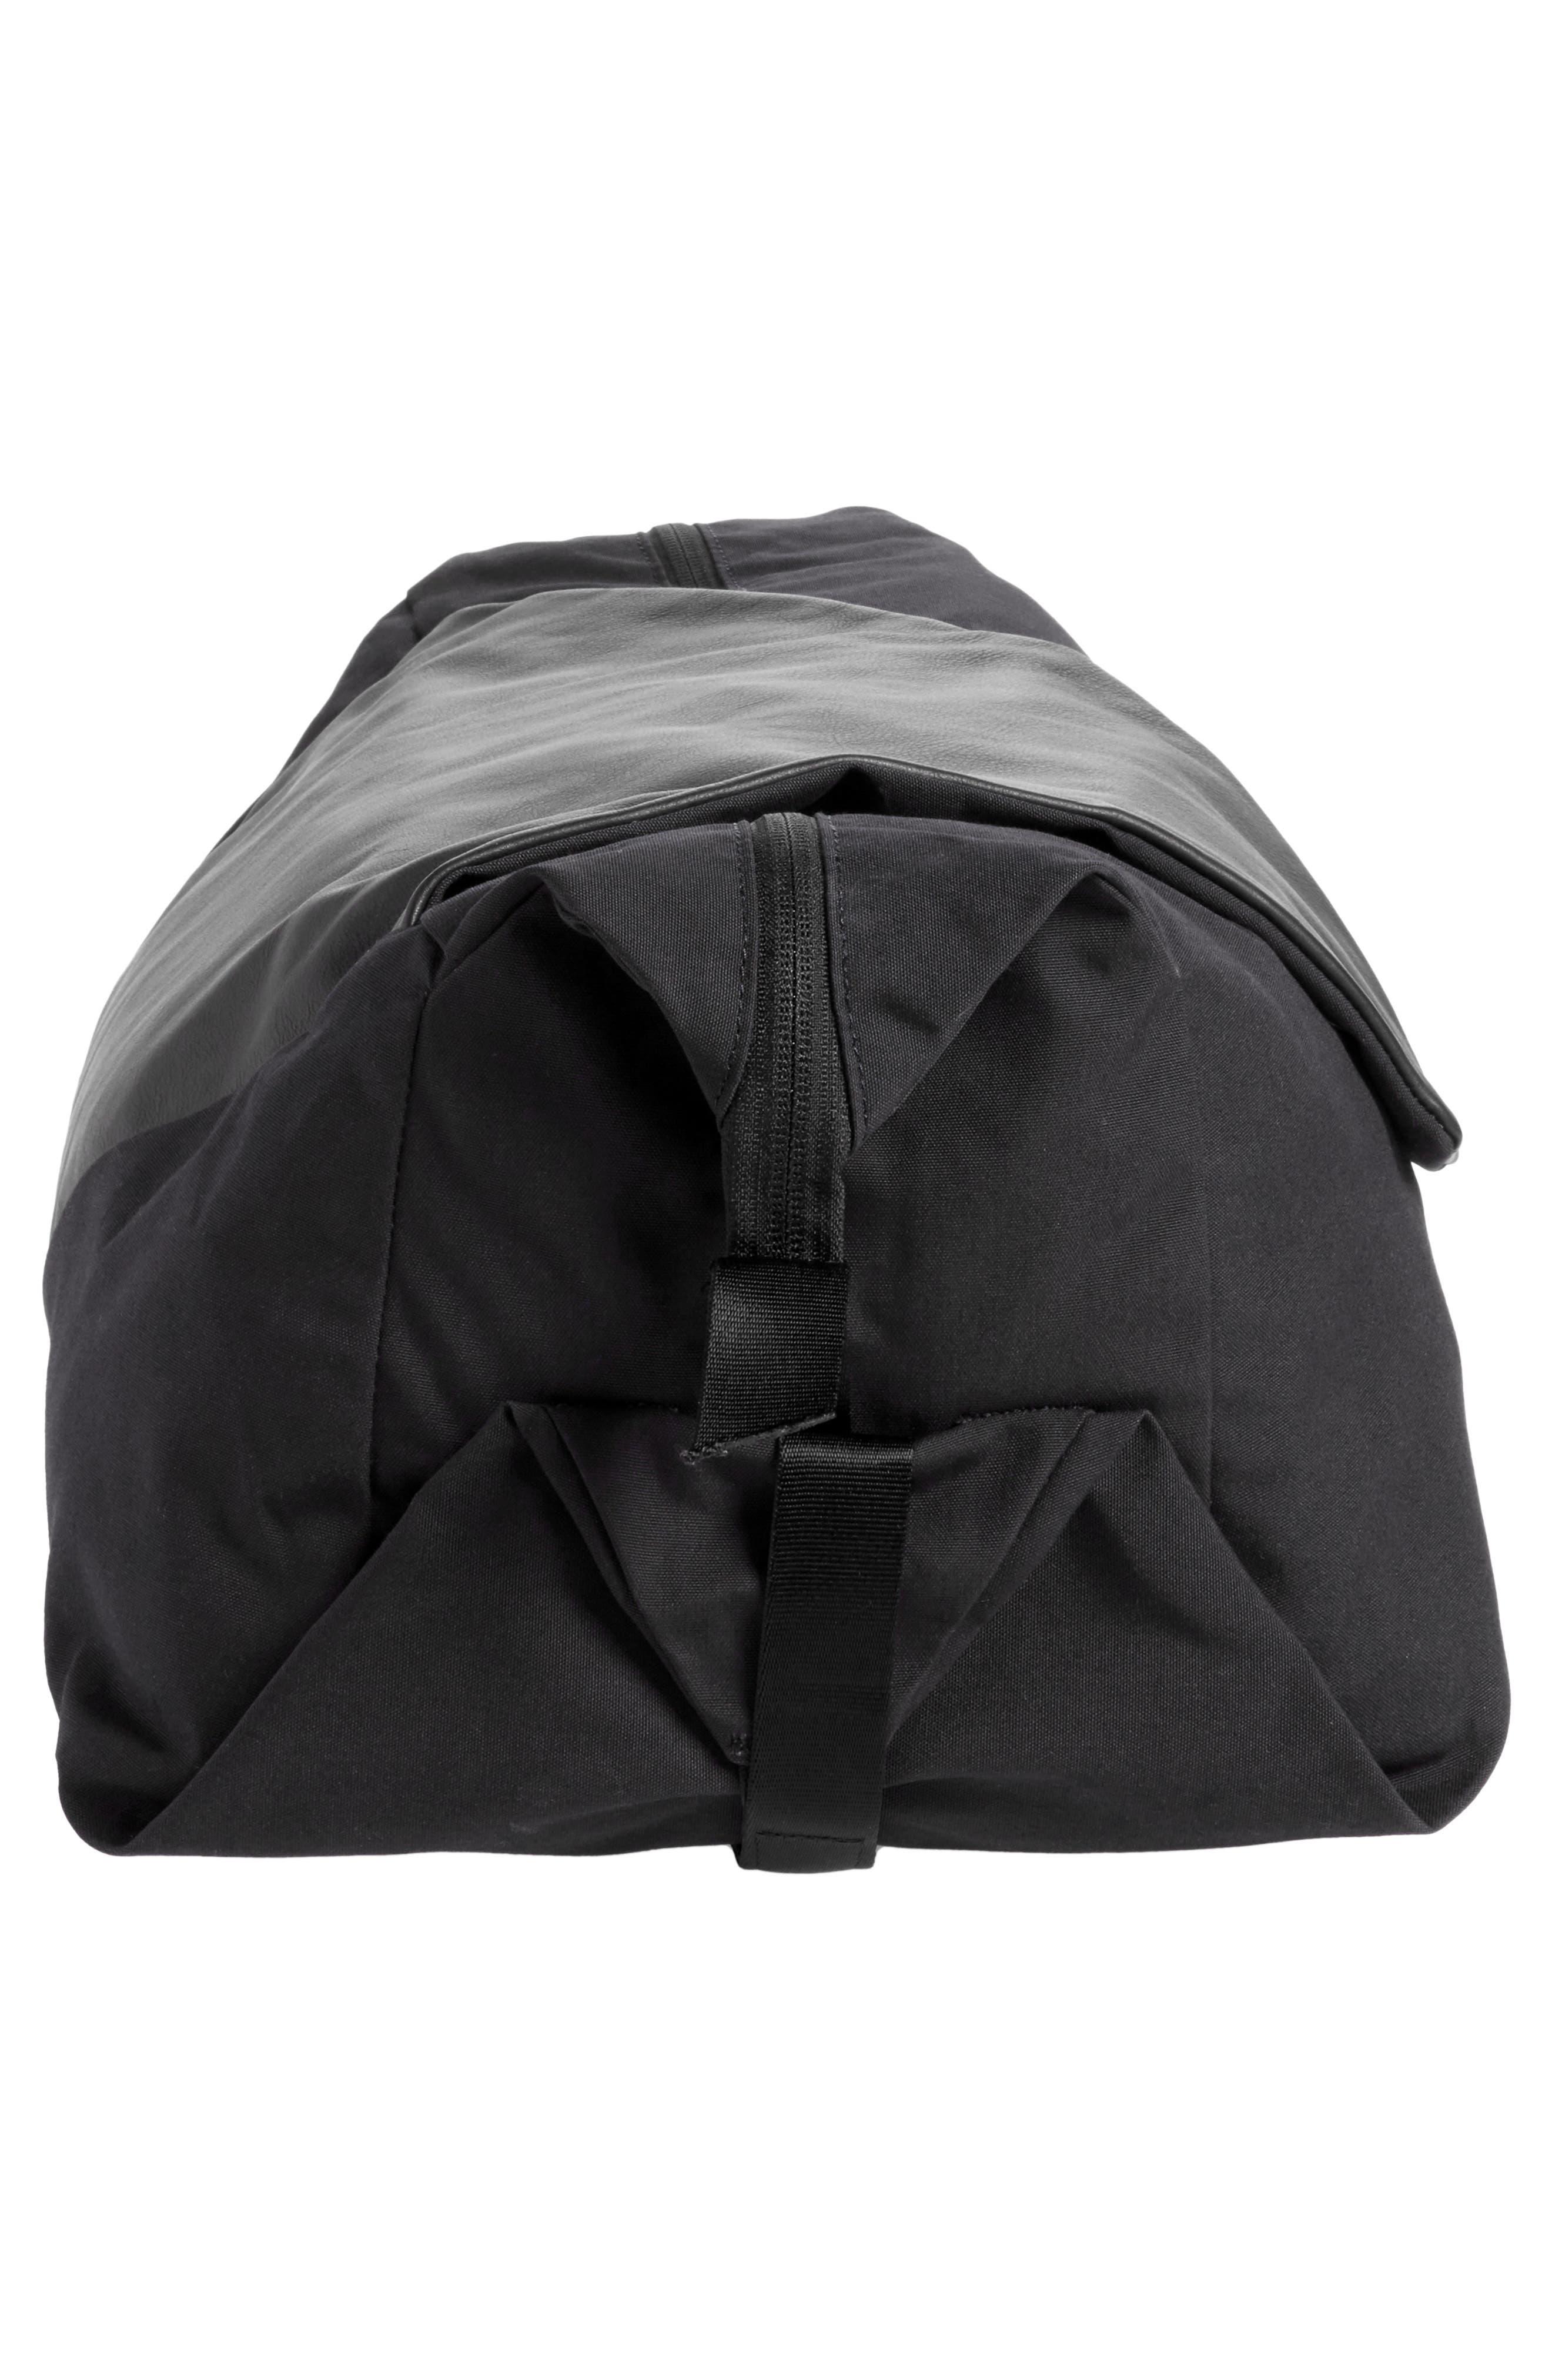 Lux Daily Duffel Bag,                             Alternate thumbnail 6, color,                             001